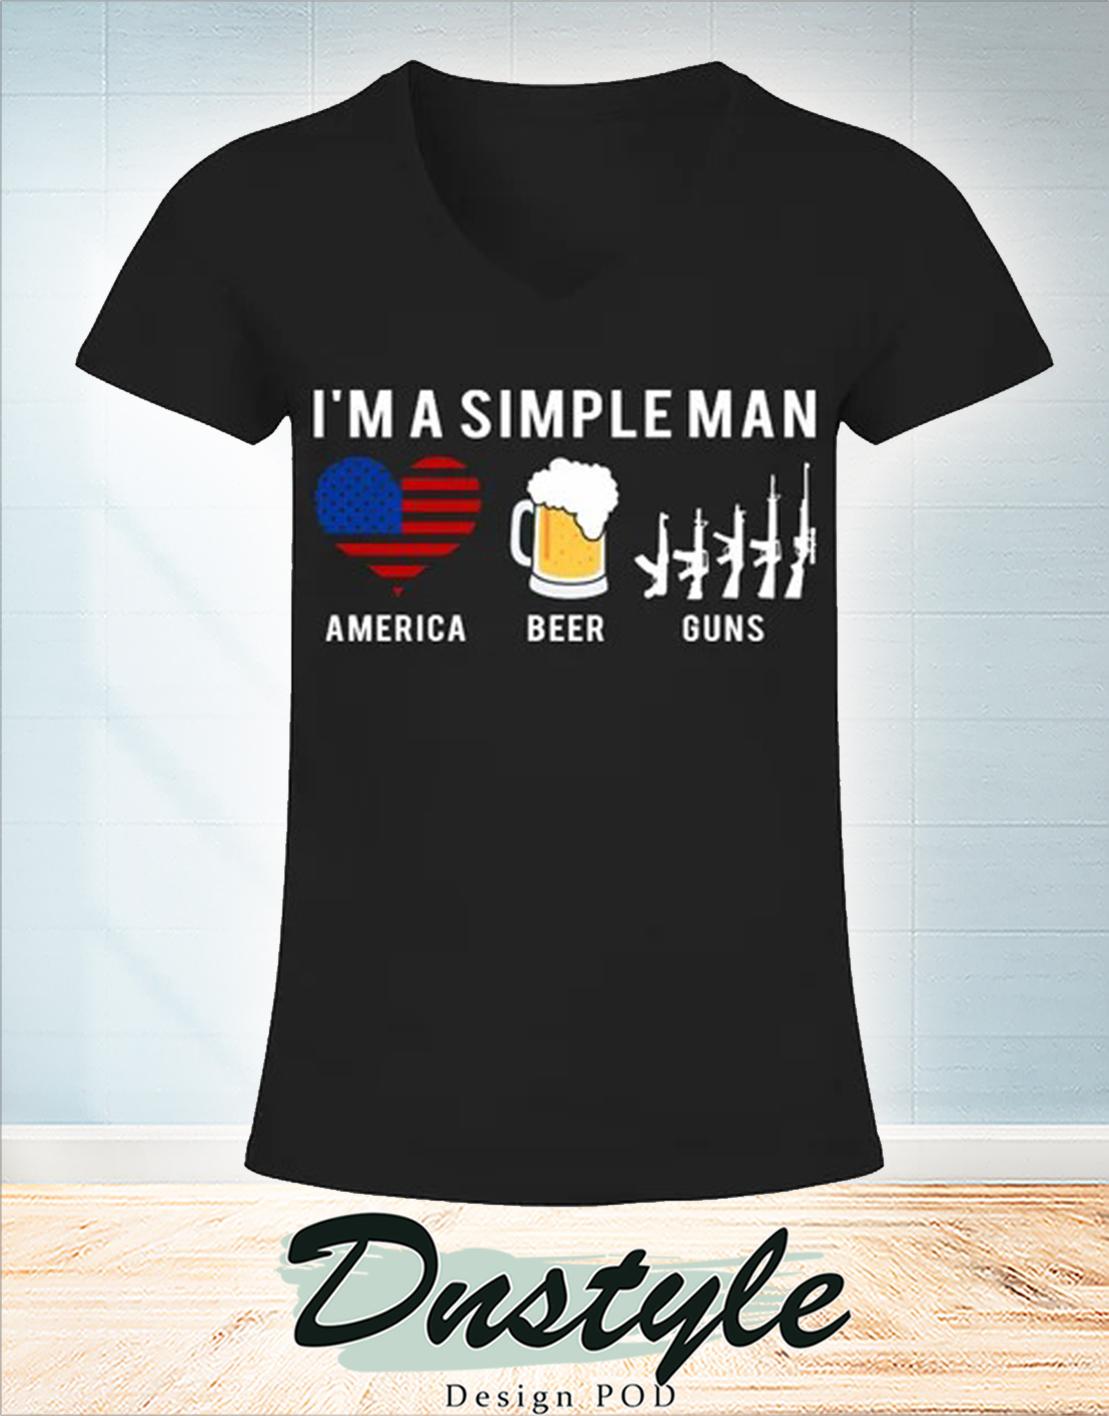 I'm a simple man america beer guns v-neck